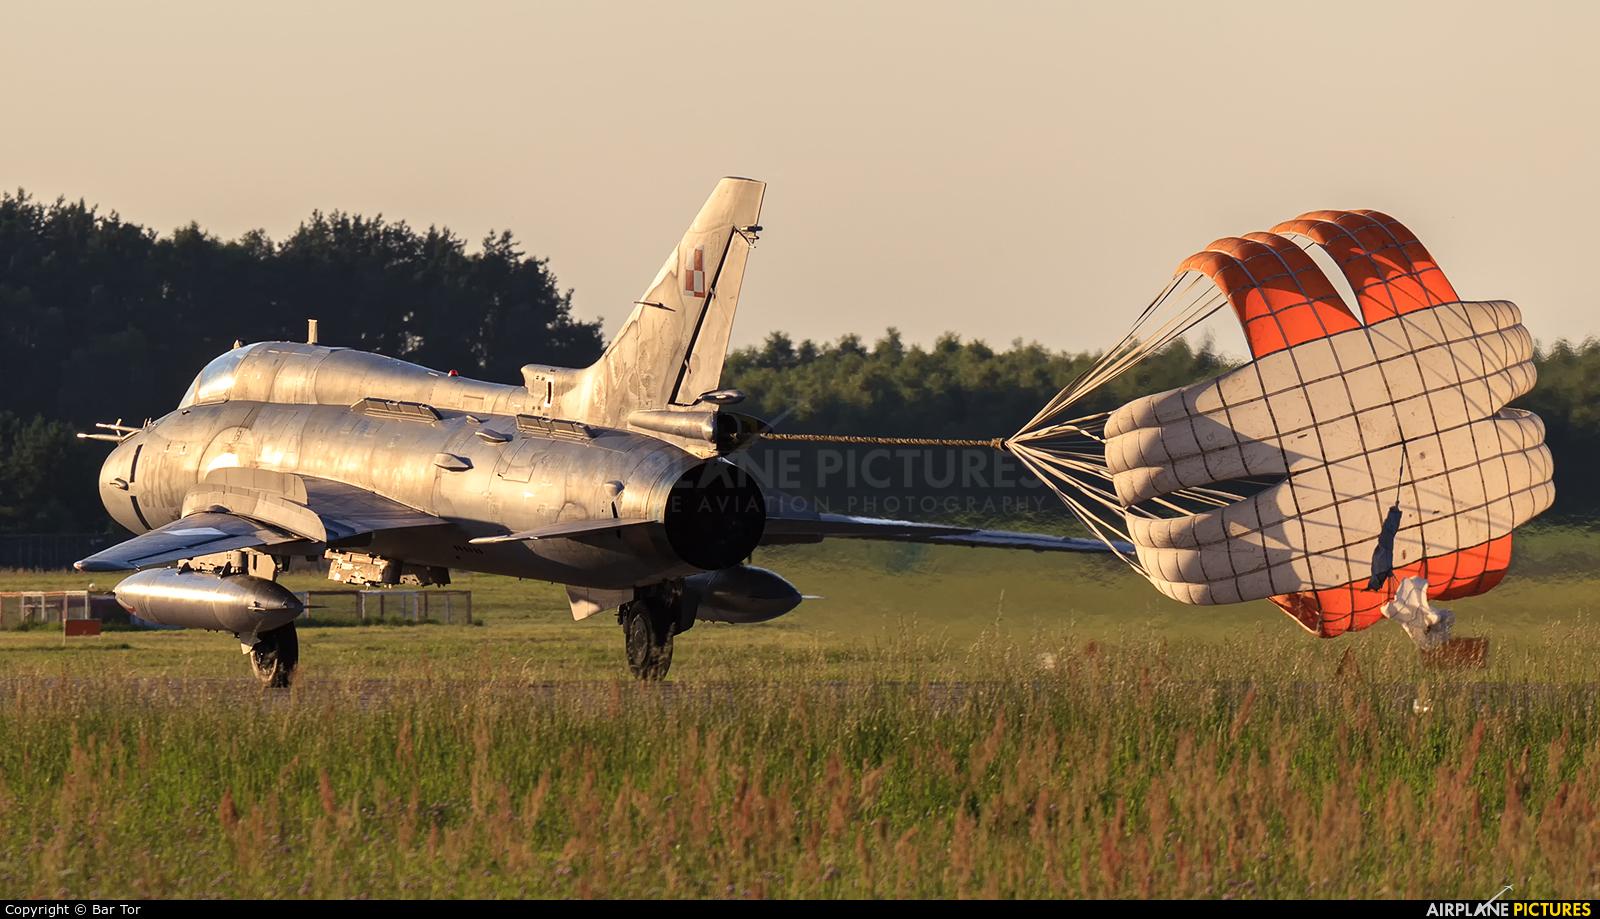 Poland - Air Force 3713 aircraft at Mirosławiec